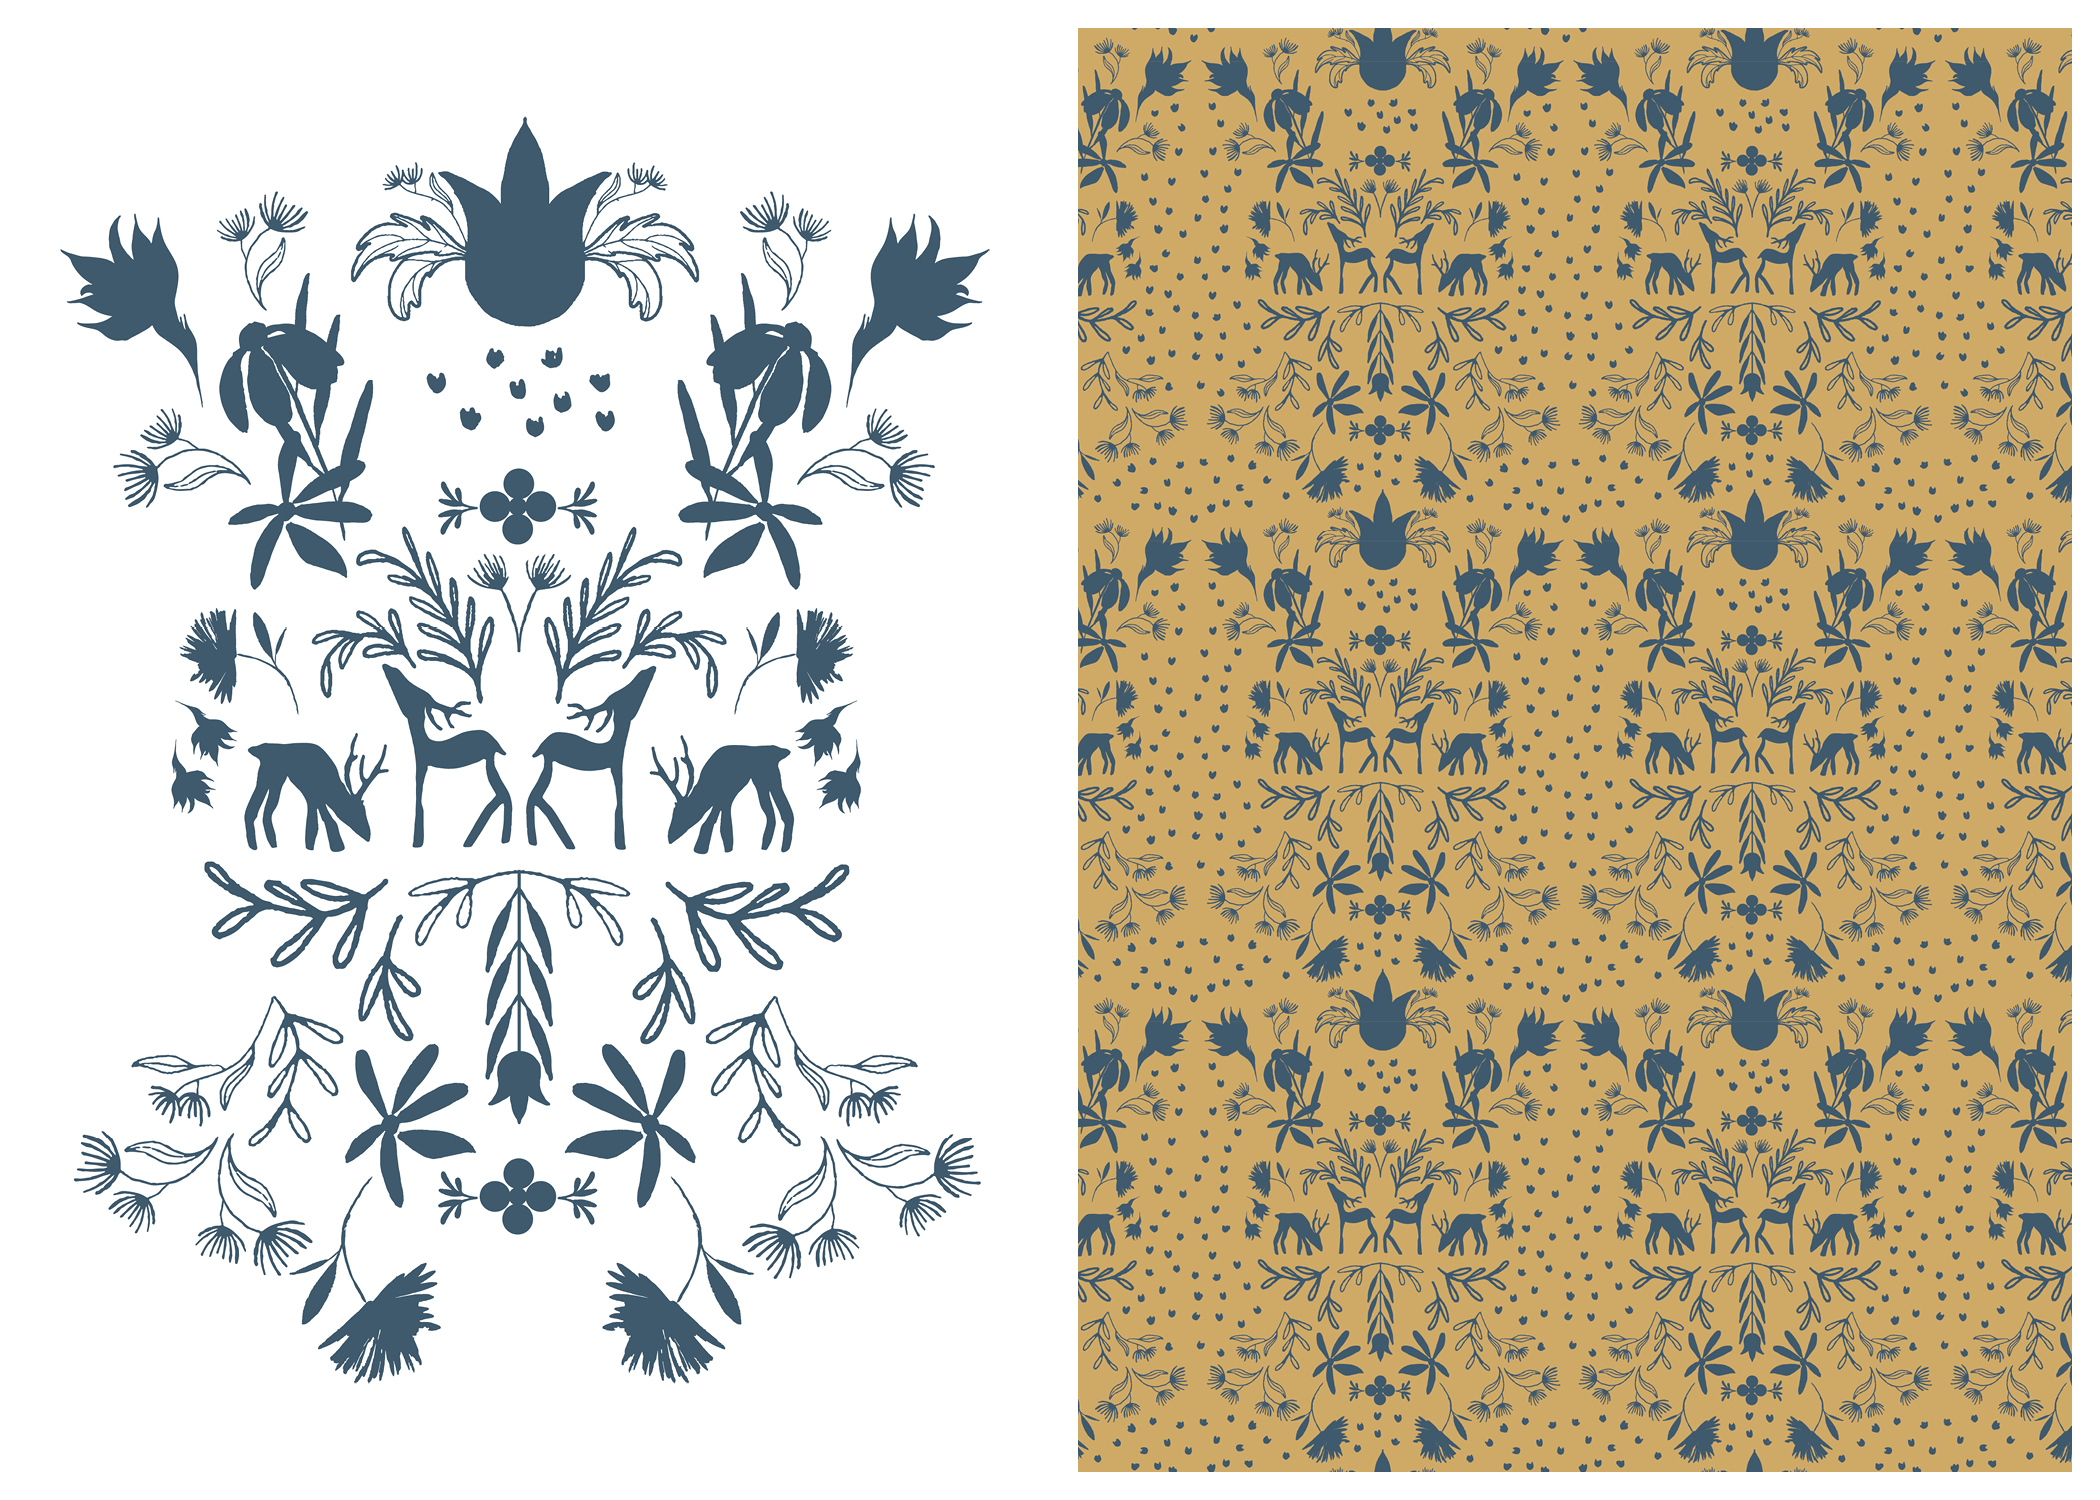 surface pattern design by HOPE johnson14.jpg